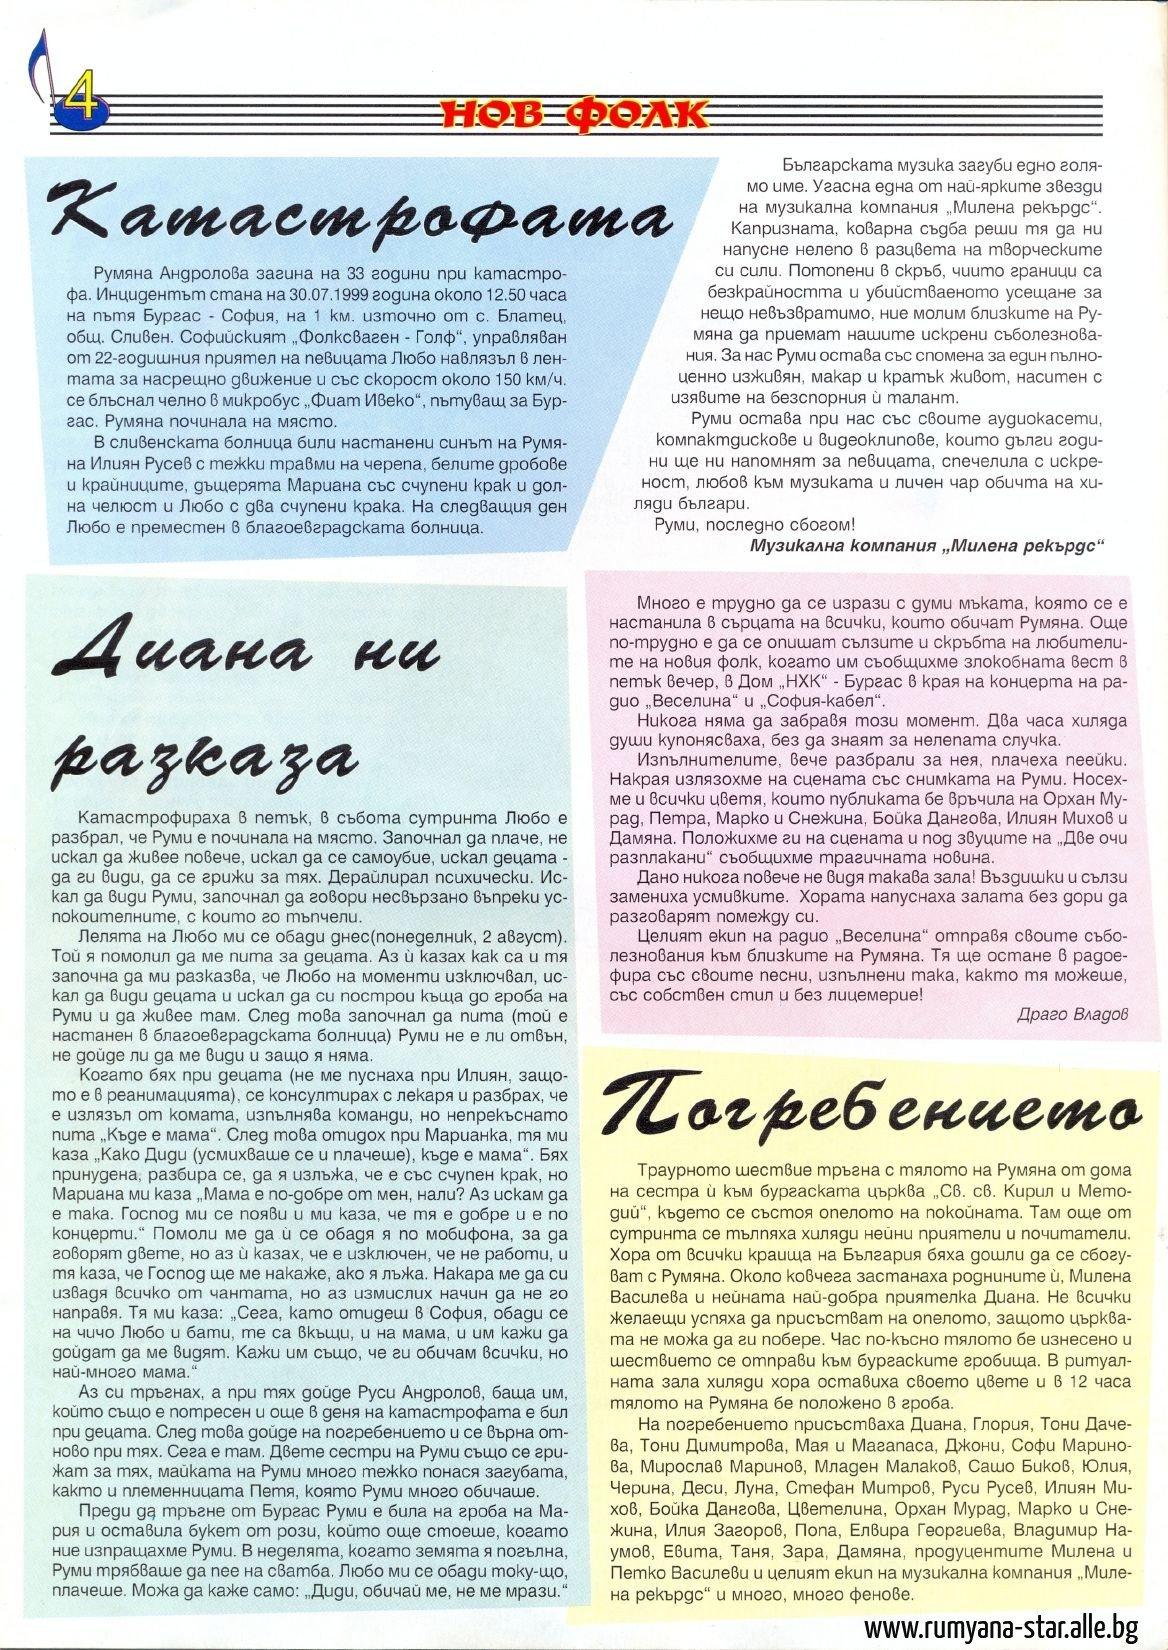 "специални броеве на списание ""Нов фолк"""